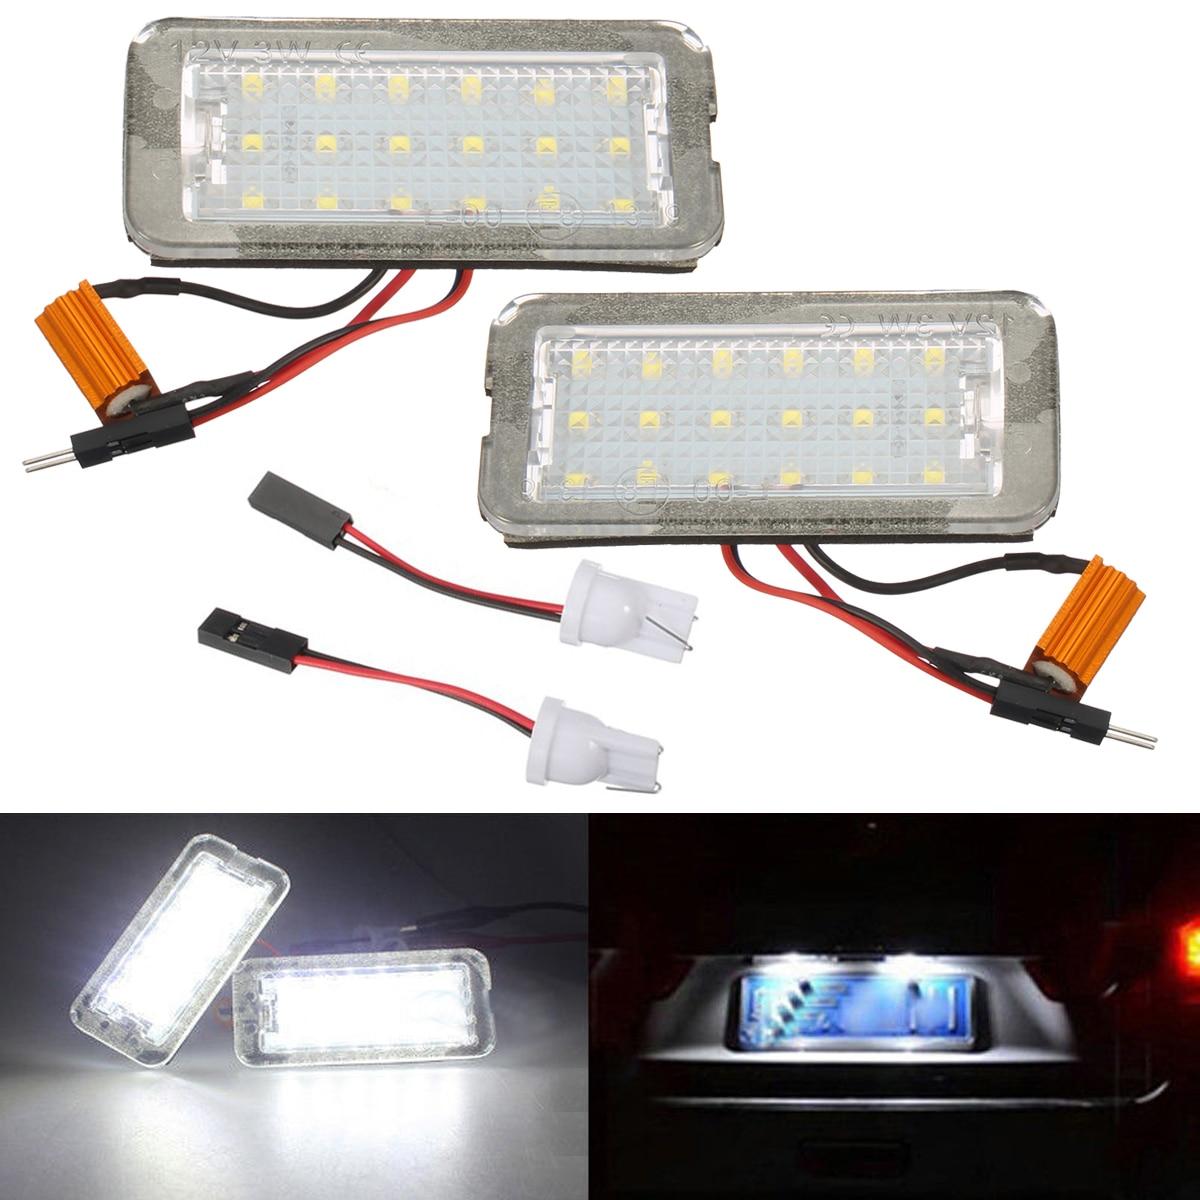 Hot Sale Error Free White Led Number Car License Plate Lights Lamp Wiring Light New 12v Licence For Fiat 500 500c Color